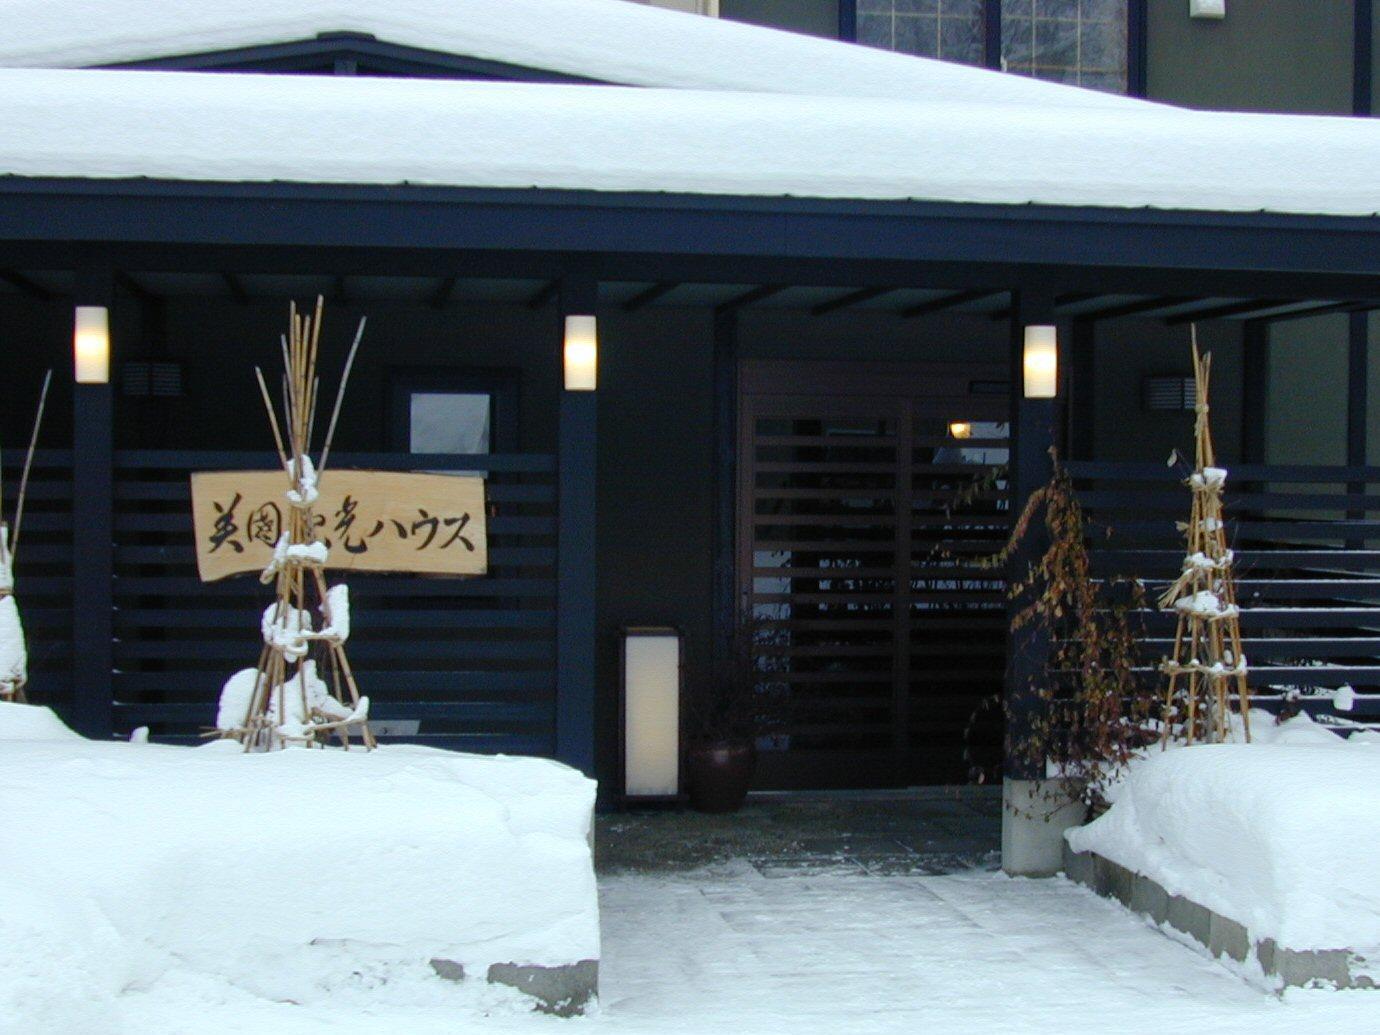 Bikuni Kanko House